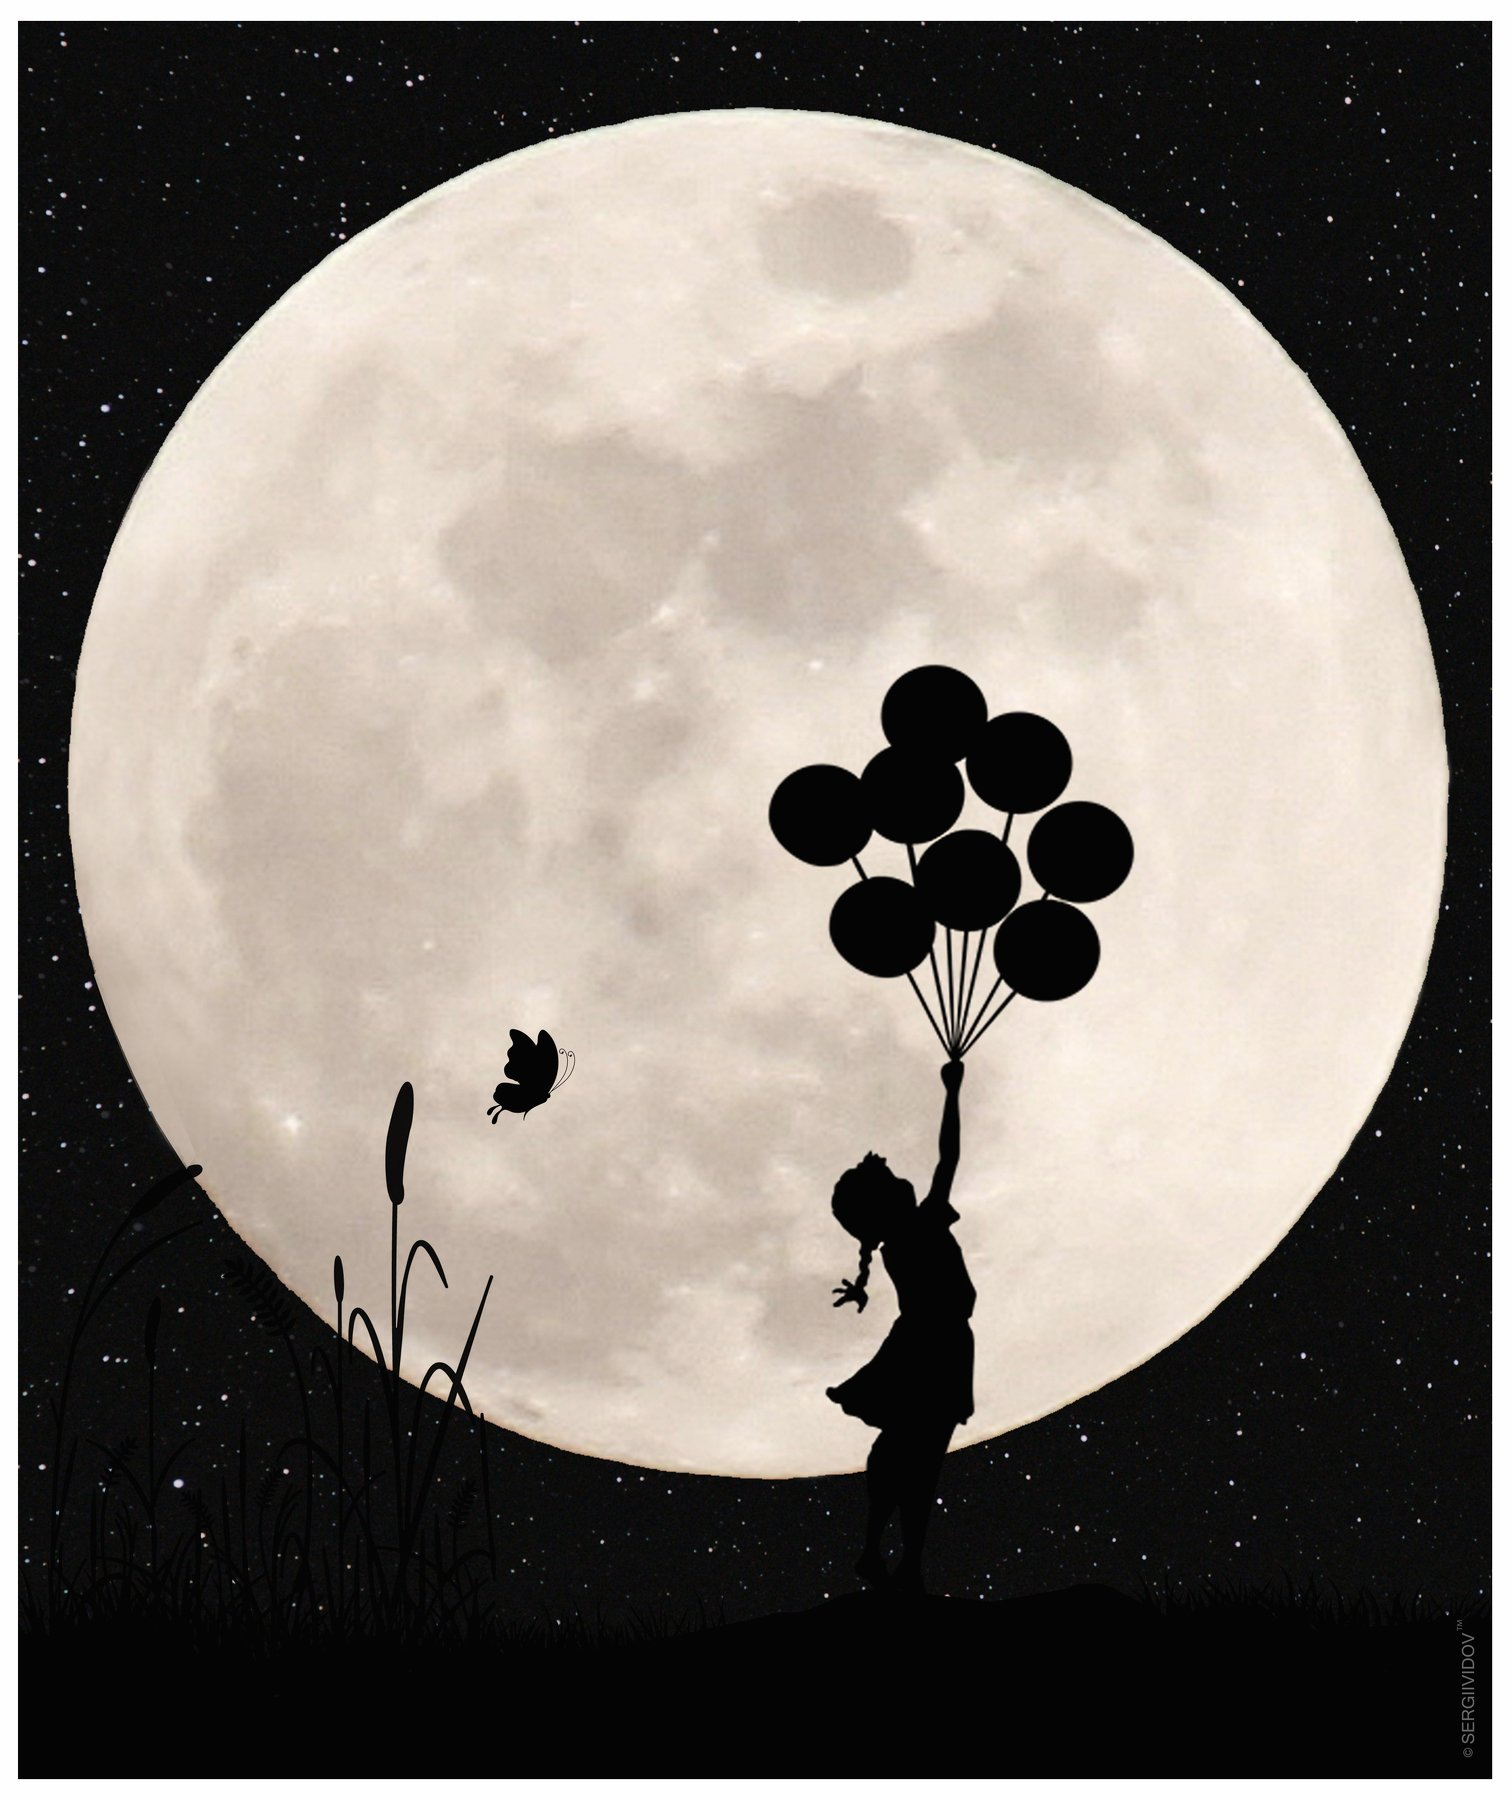 луна, воздушные шары, небо, ночь, ребенок, Sergii Vidov